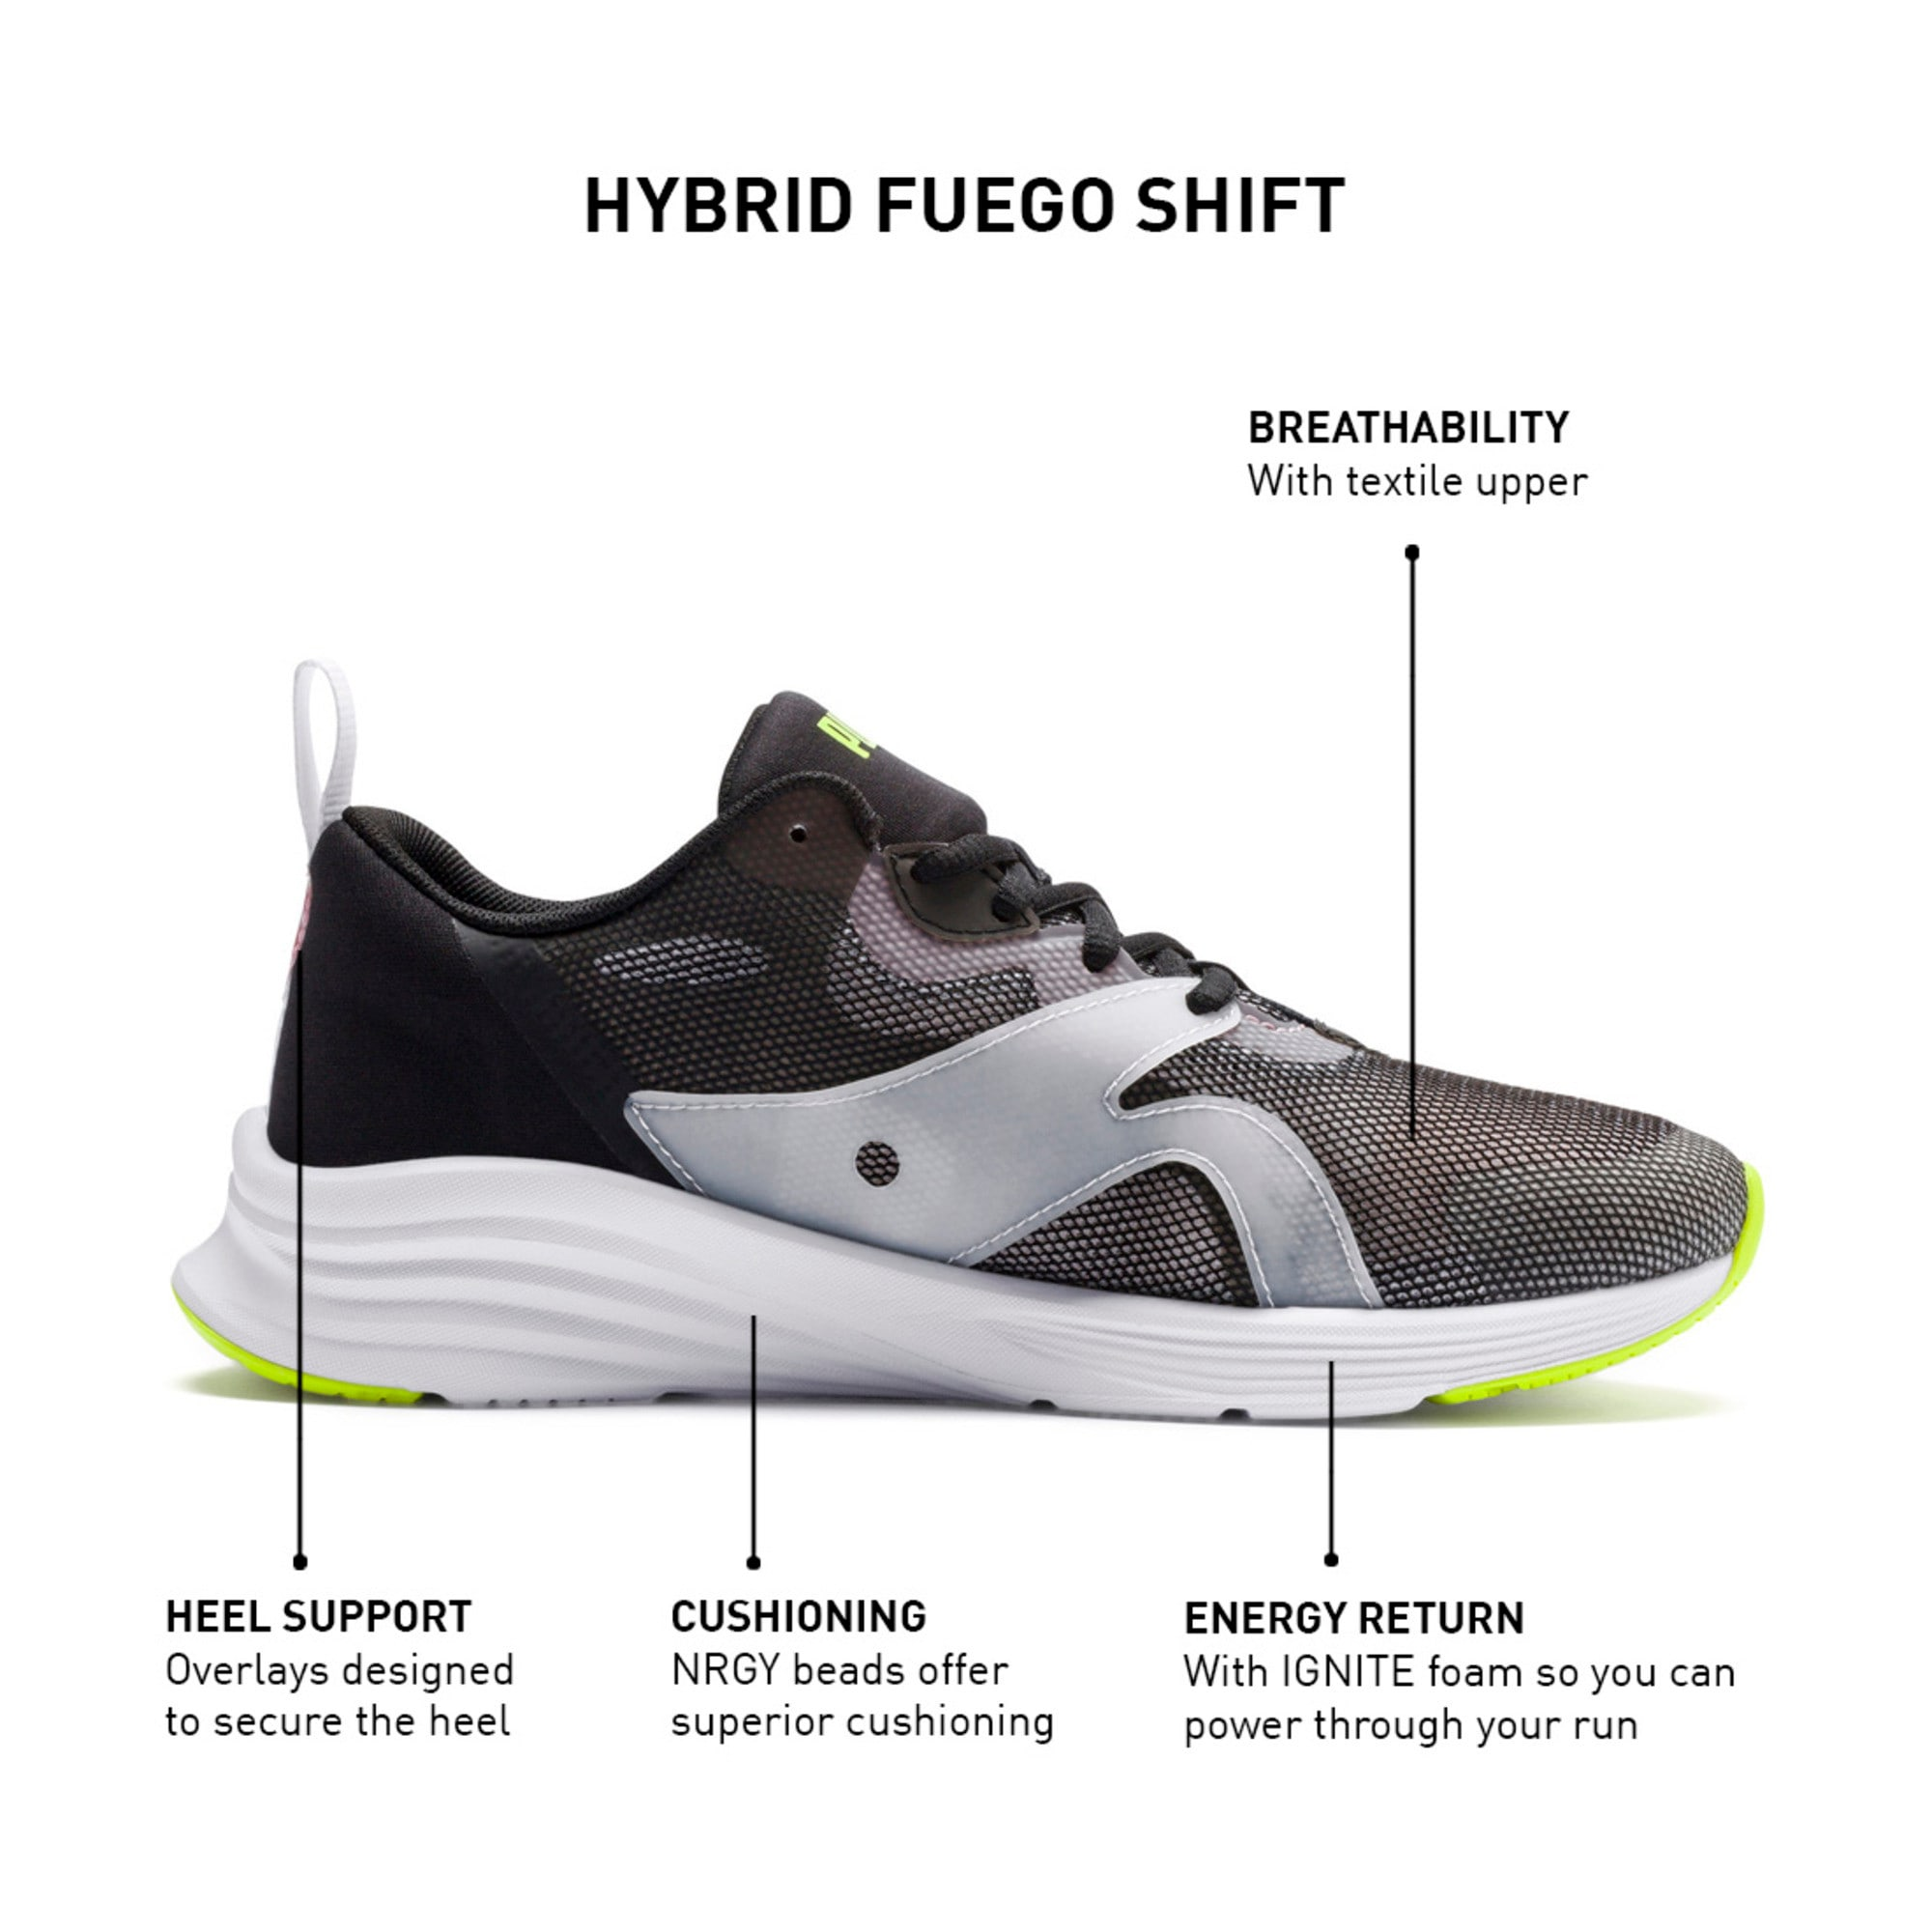 Thumbnail 9 of HYBRID Fuego Shift Women's Running Shoes, Puma Black-Bridal Rose, medium-IND